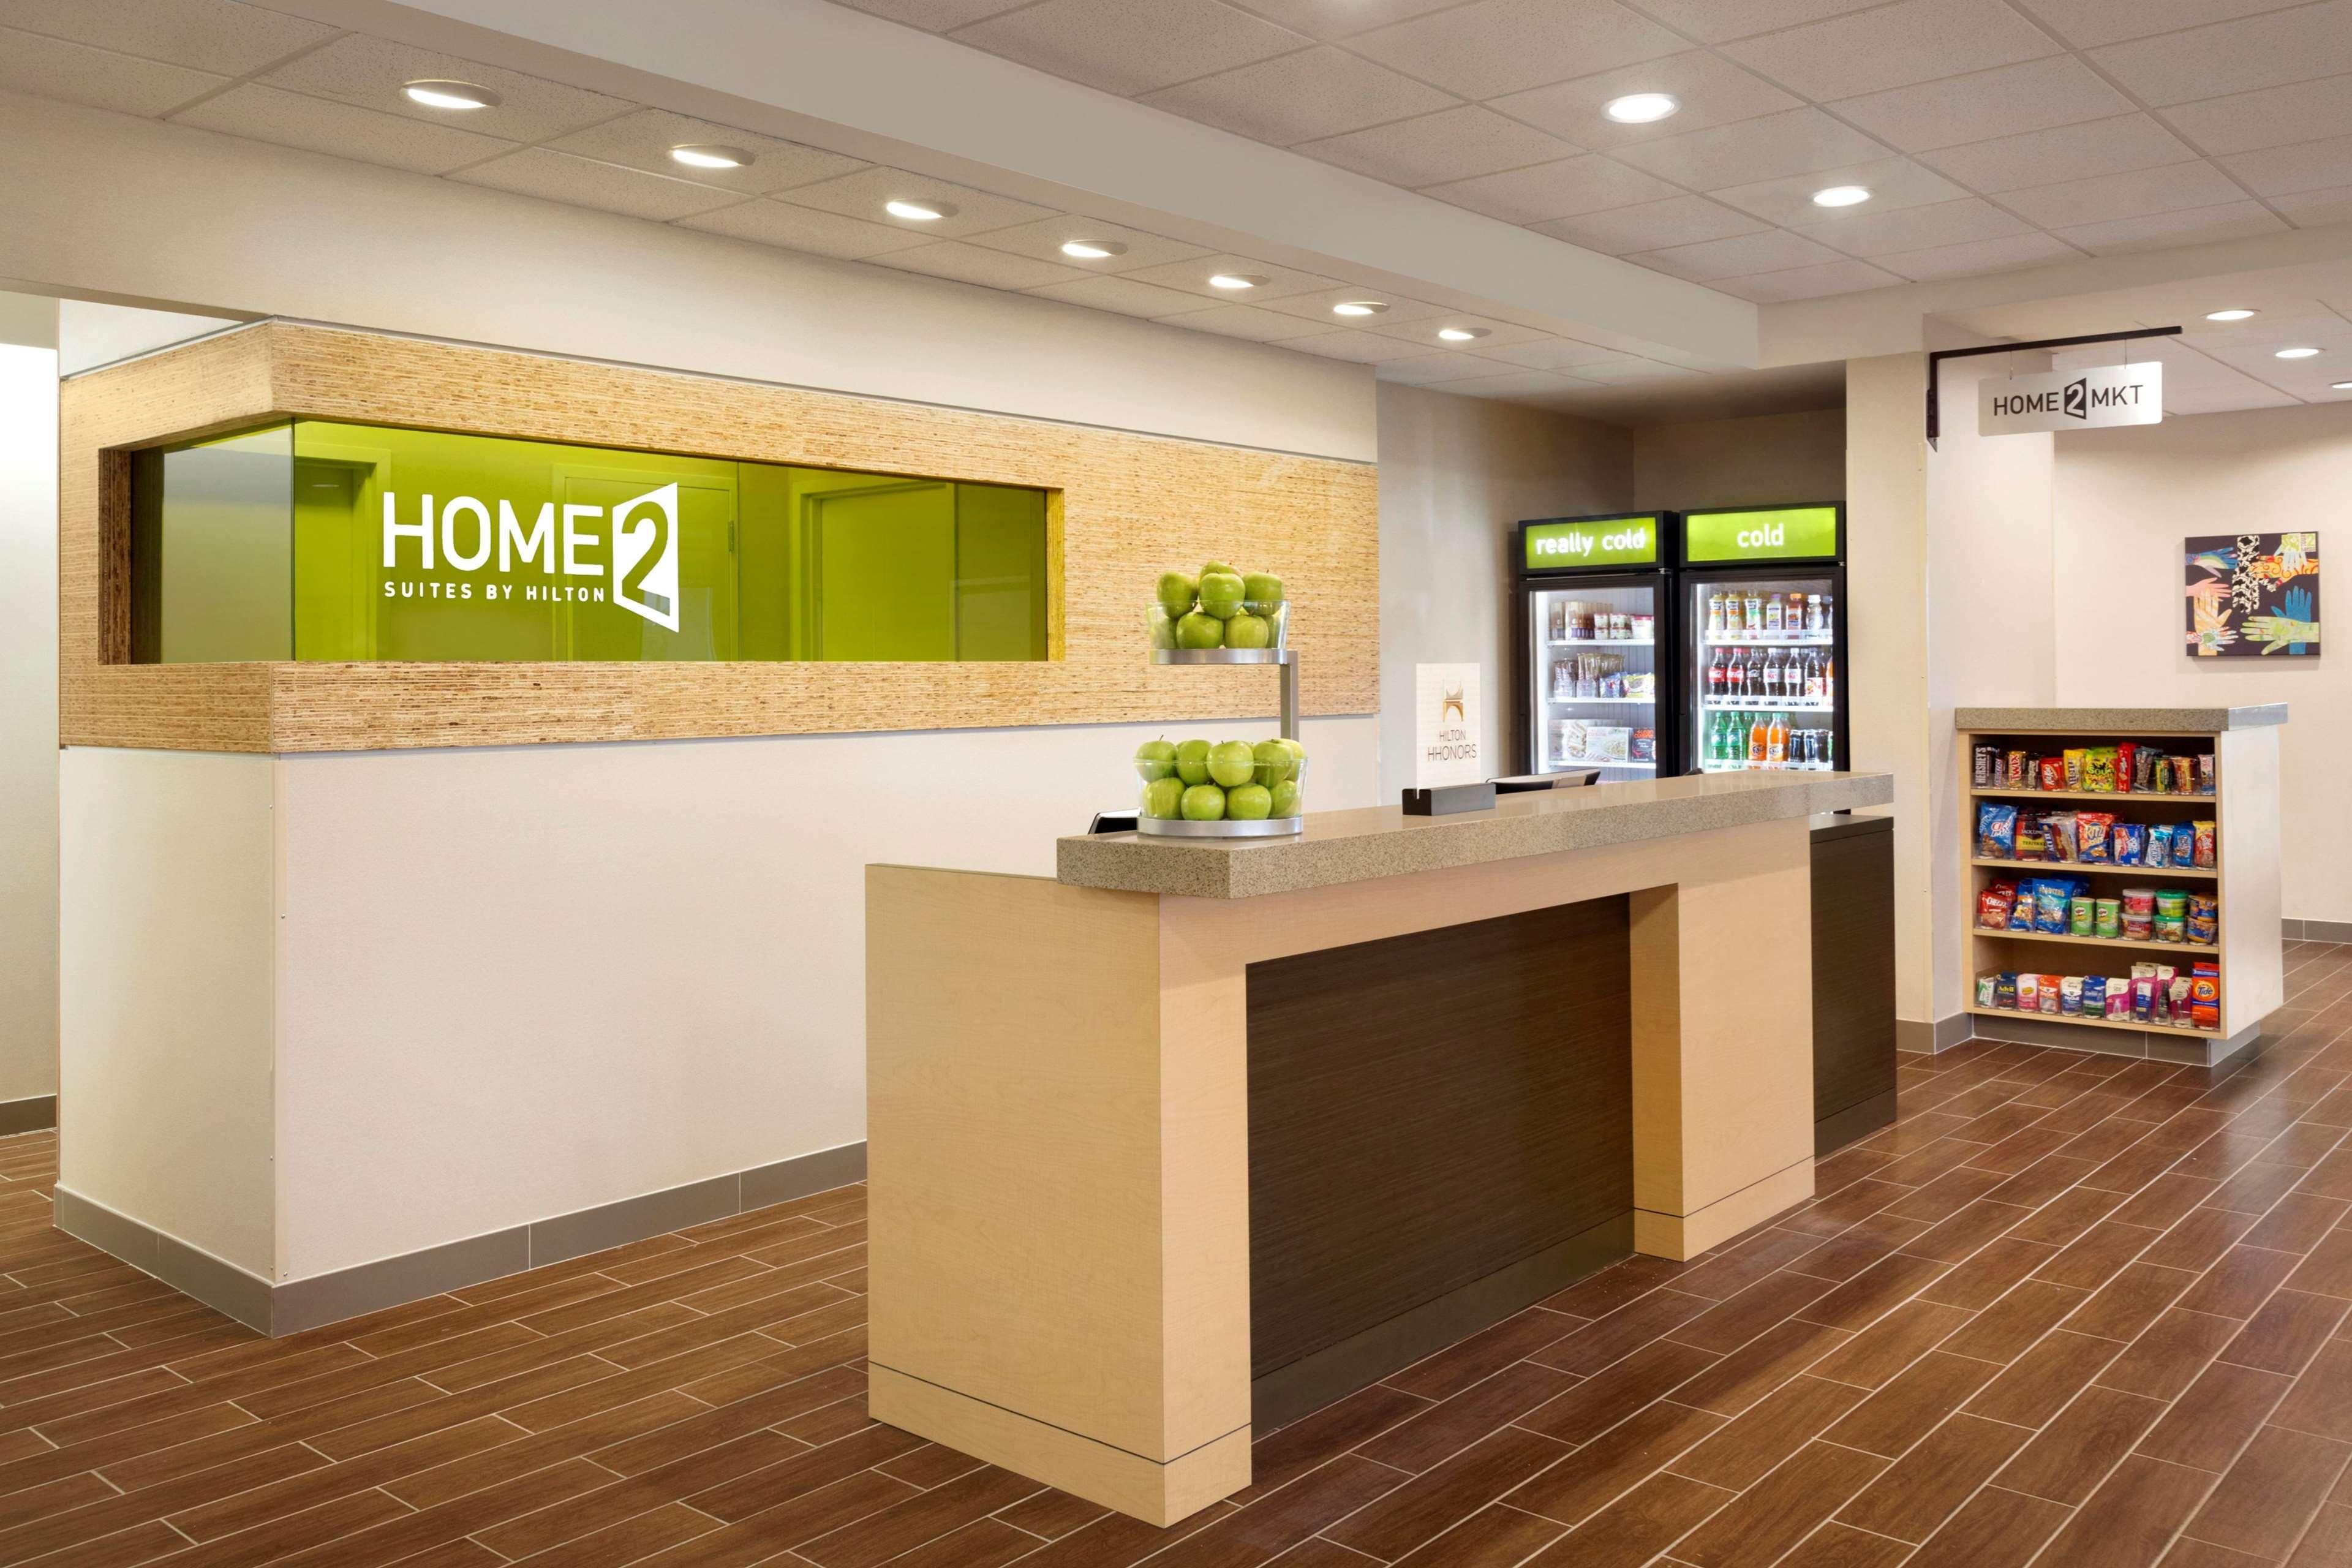 Home2 Suites by Hilton Houston Pasadena image 1